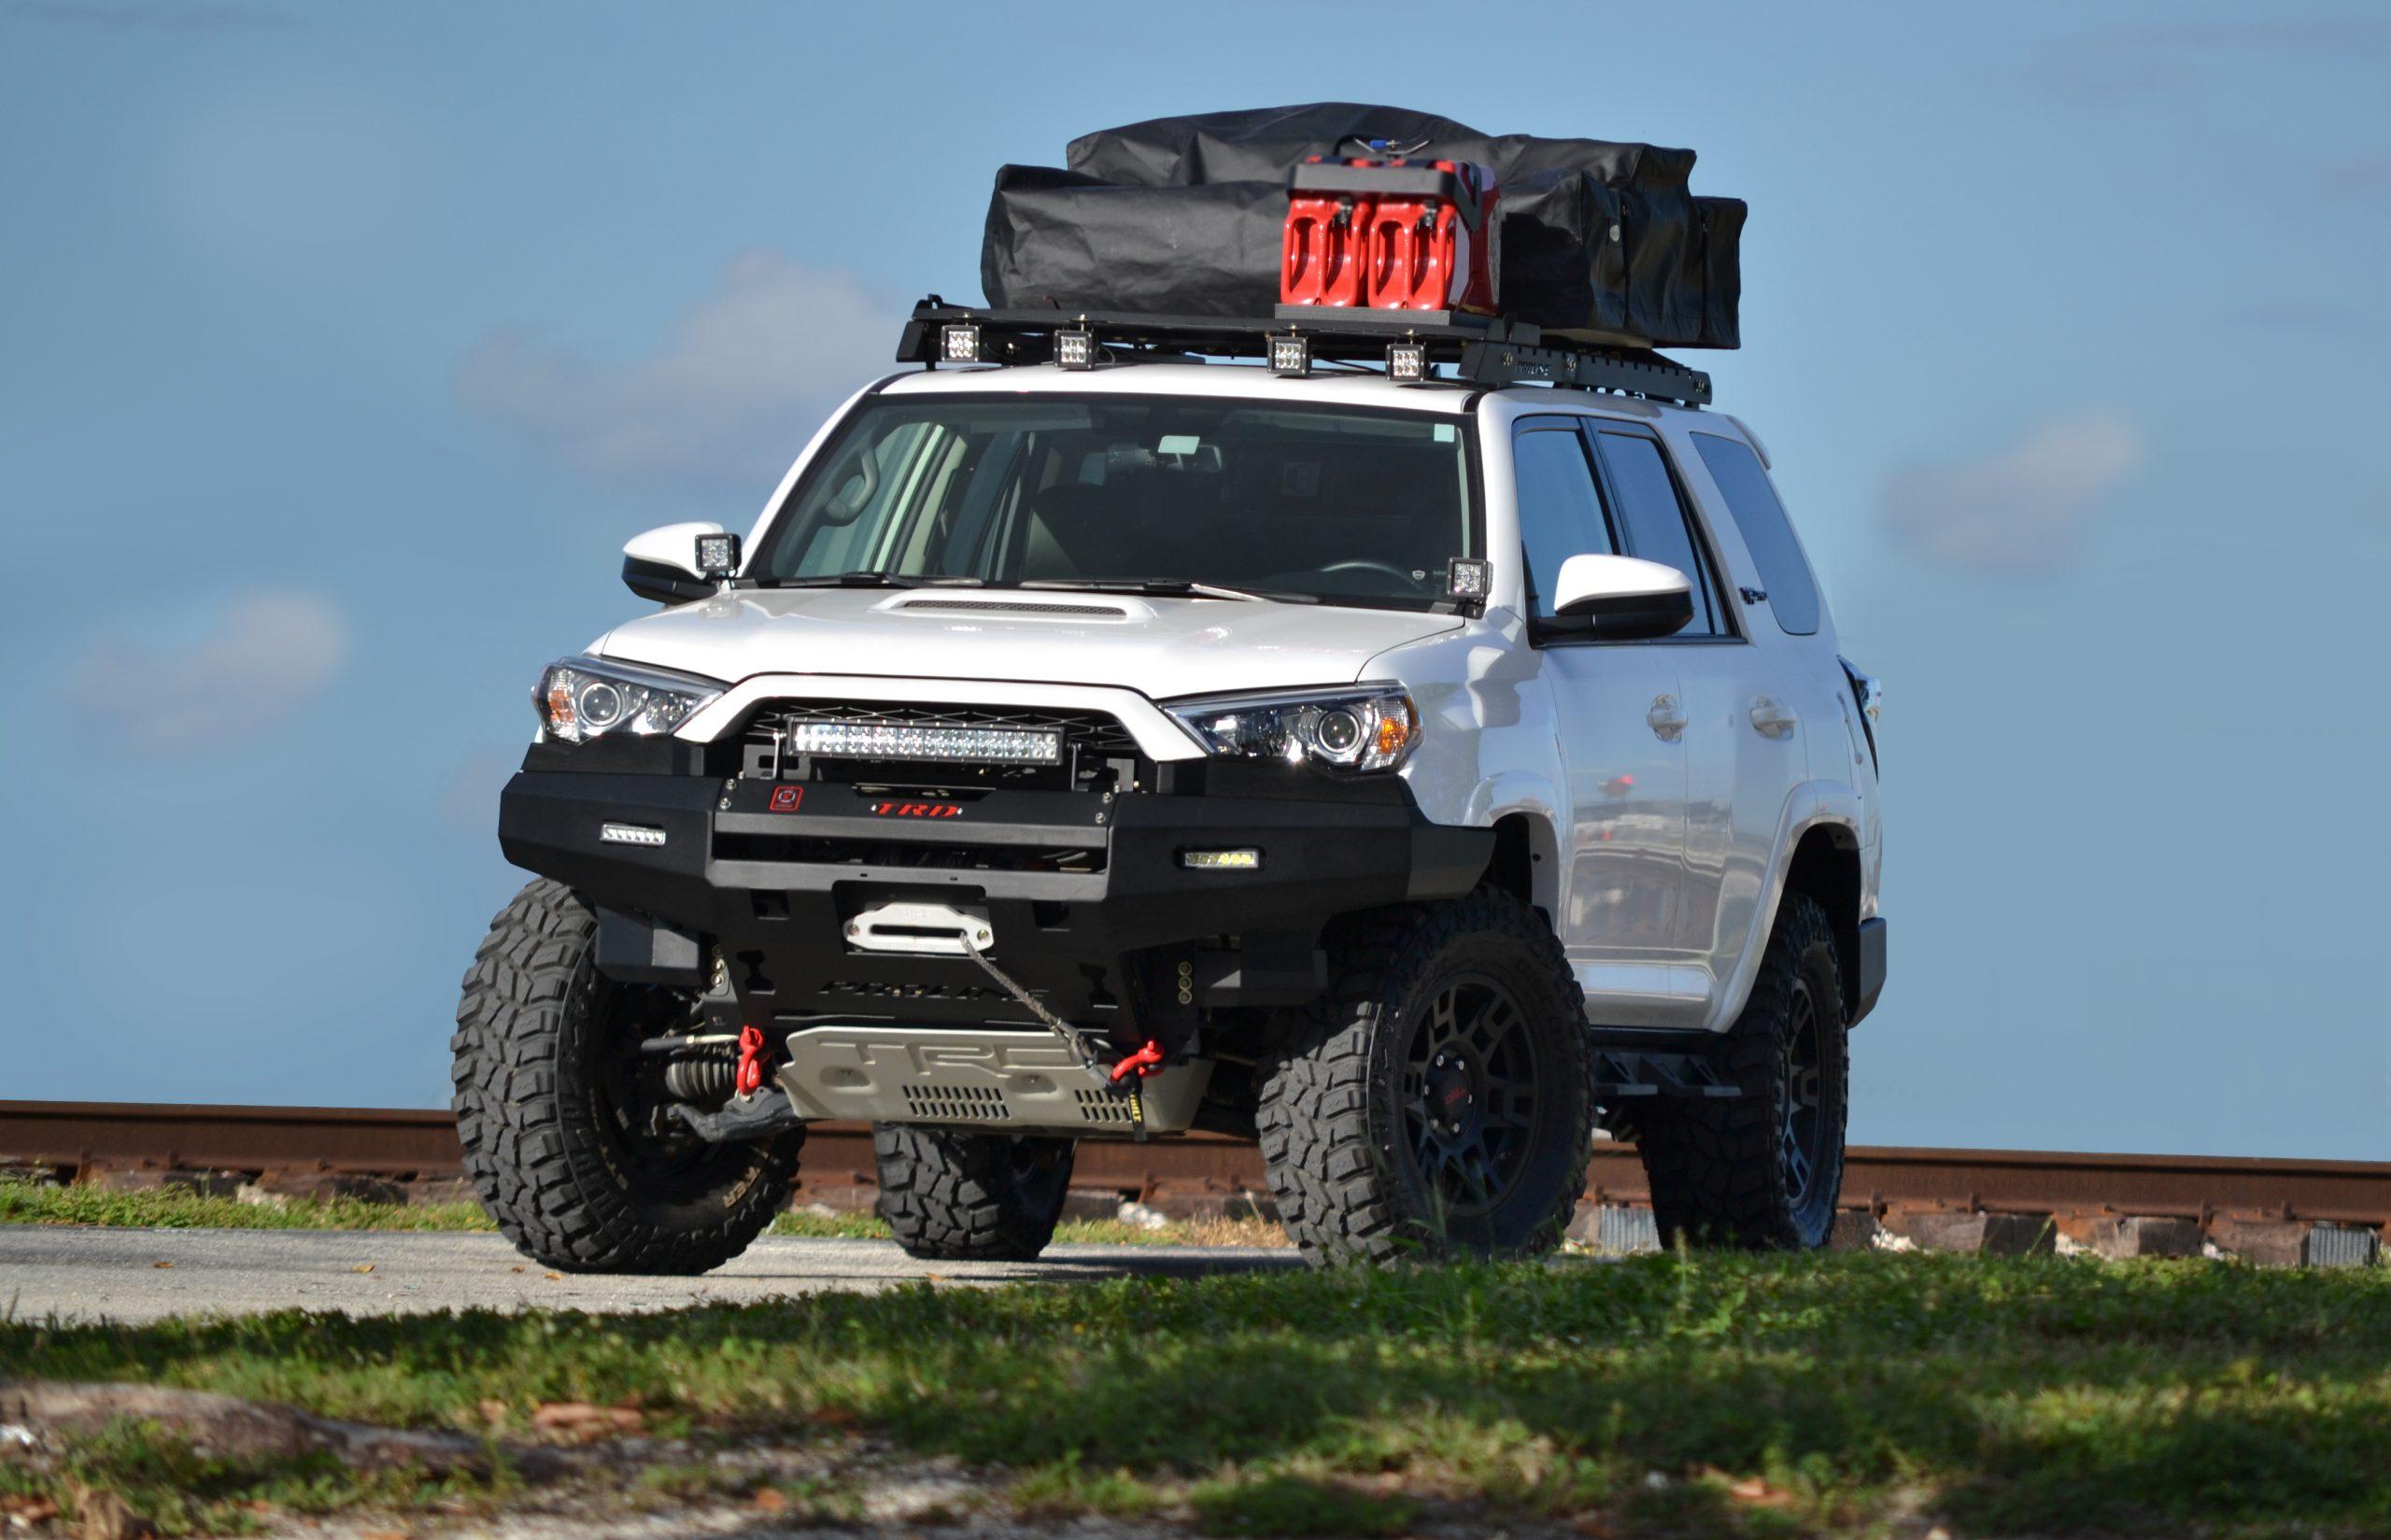 Toyota 4runner 5th Gen Front Elite Bumper Fits 2010 2018 Proline 4wd Equipment Miami Florida